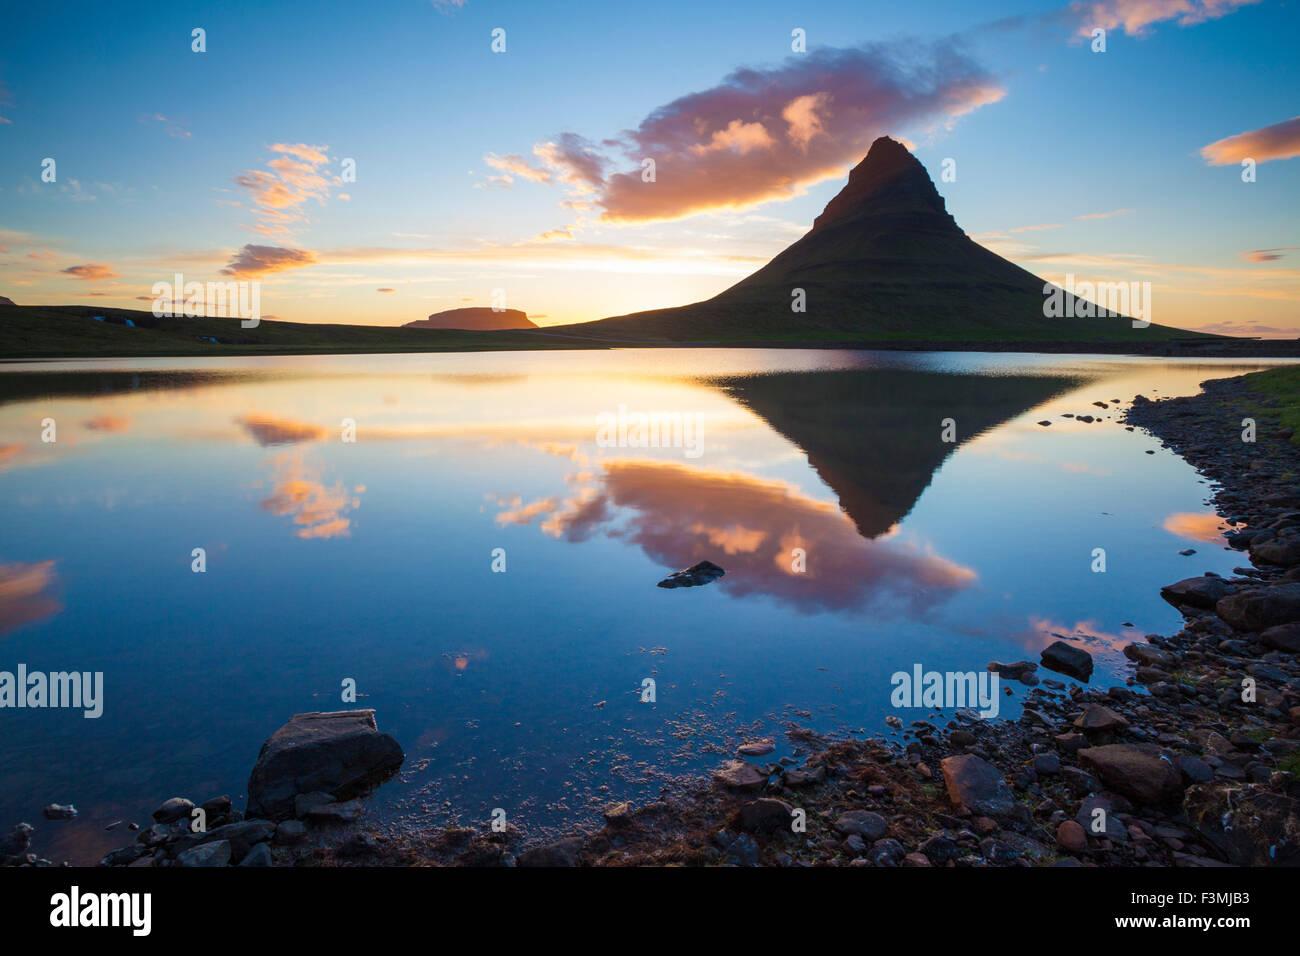 Coucher du soleil reflet de Kirkjufell mountain, Grundarfjordur, Péninsule de Snæfellsnes, Vesturland, Photo Stock